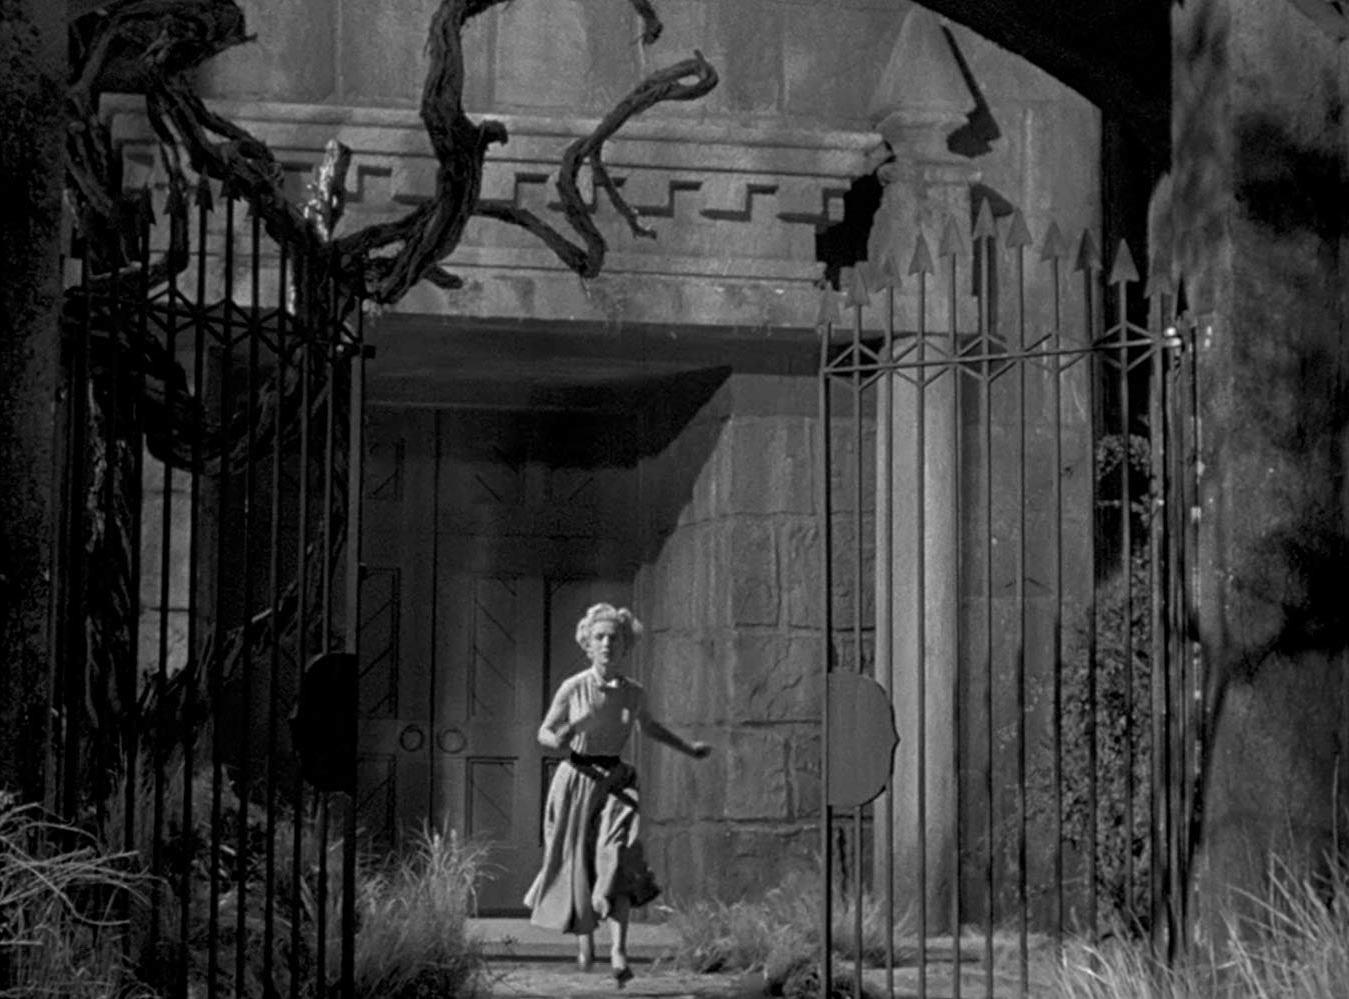 Veronica Hurst runs for the gates of Castle Craven in The Maze (1953)